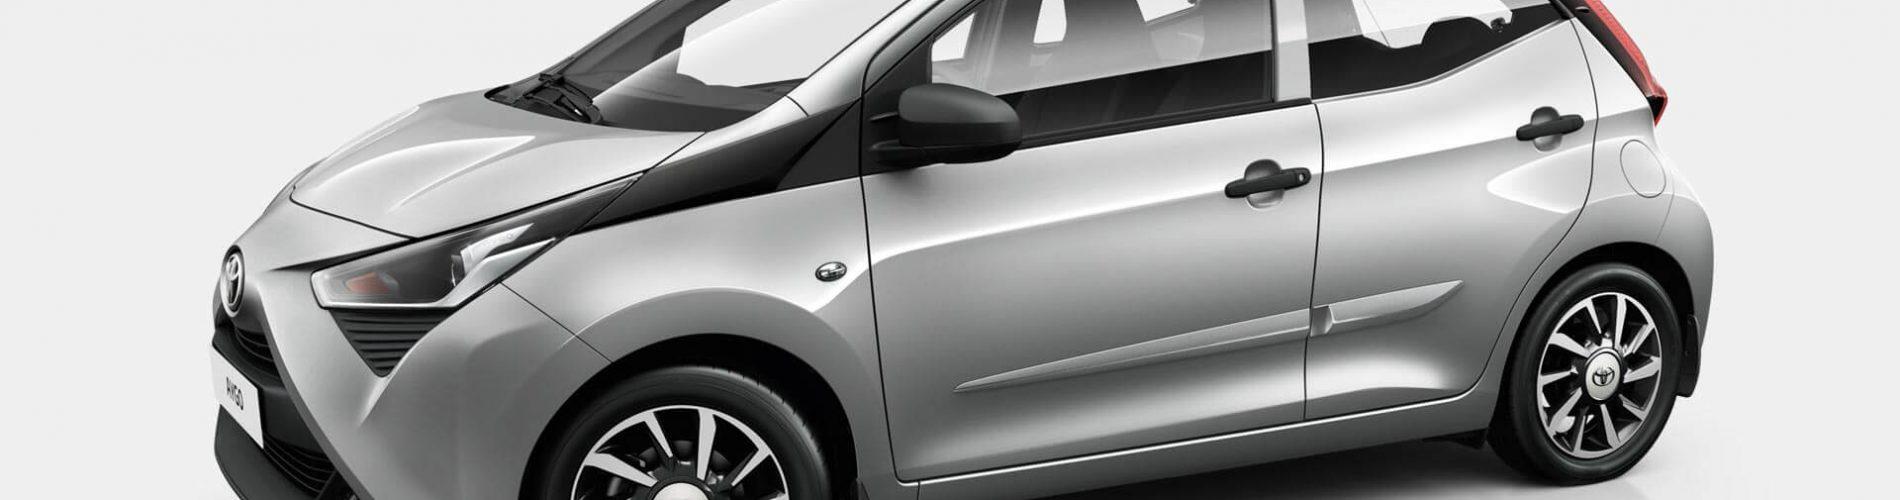 Toyota Aygo 2018/2019 forende